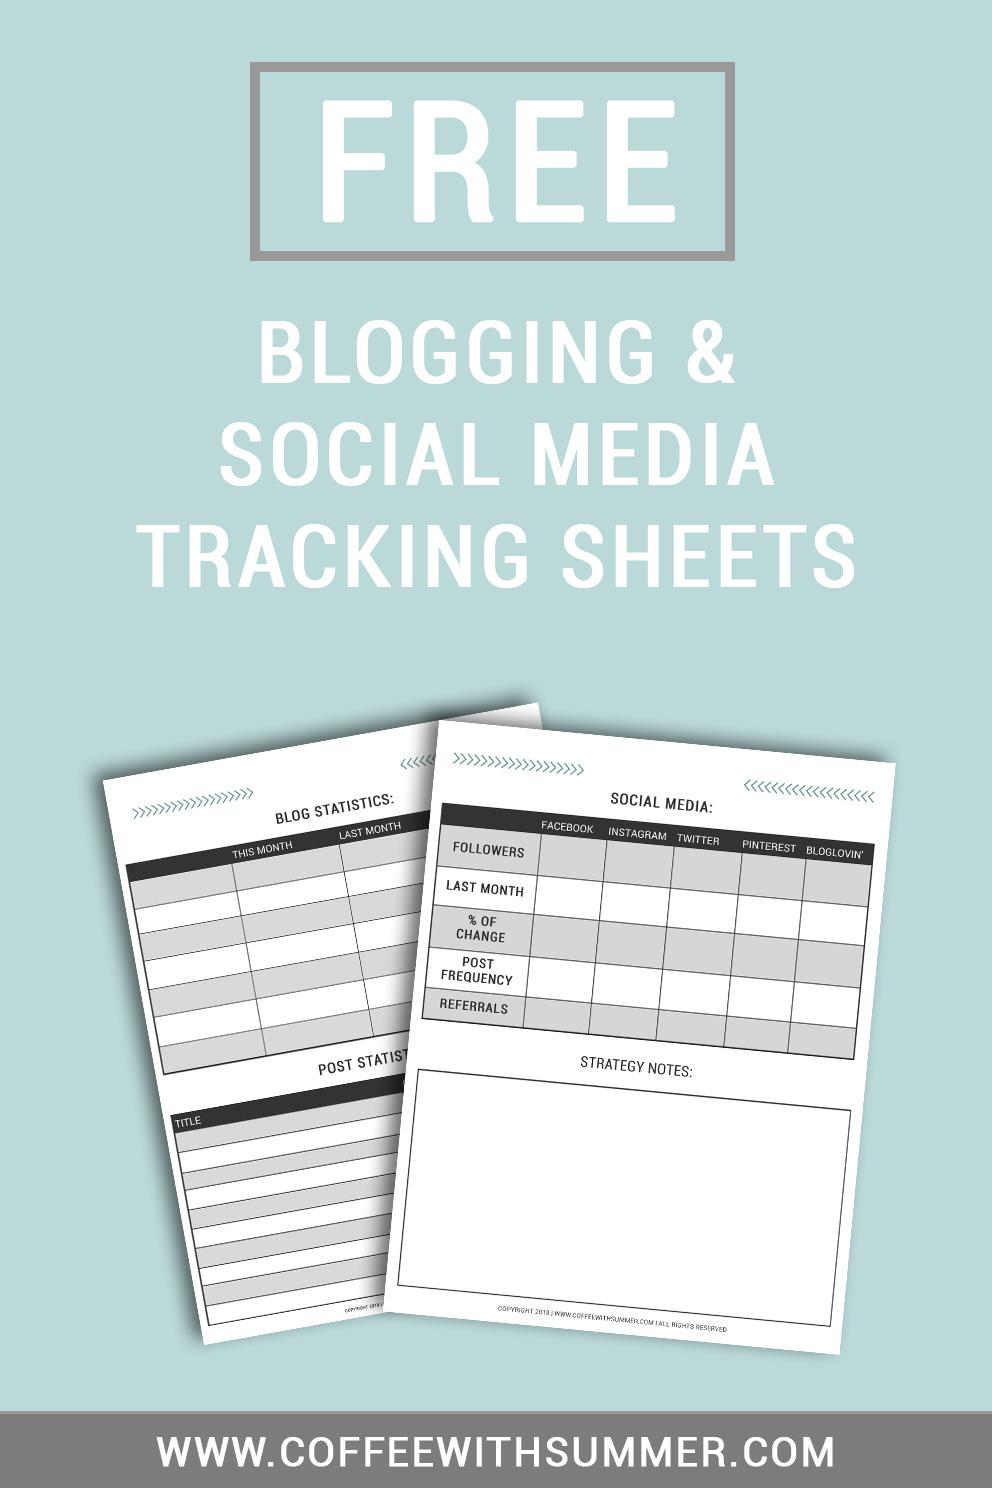 FREE Blogging & Social Media Tracking Sheets